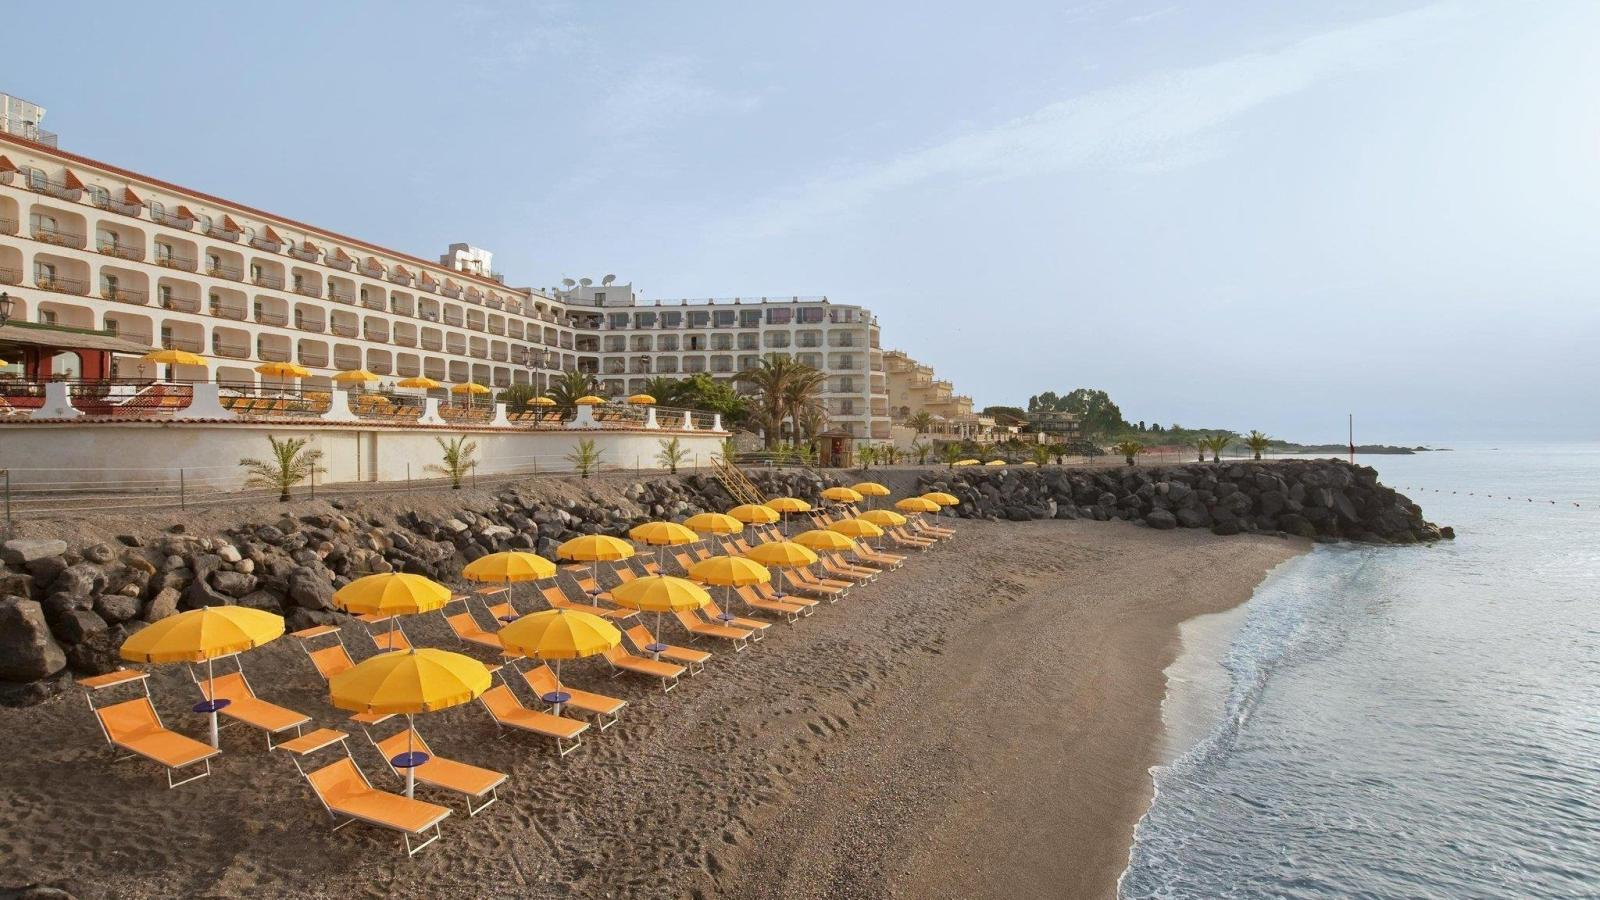 Hotel hilton giardini naxos sicily holidays - Hotel ai giardini naxos ...